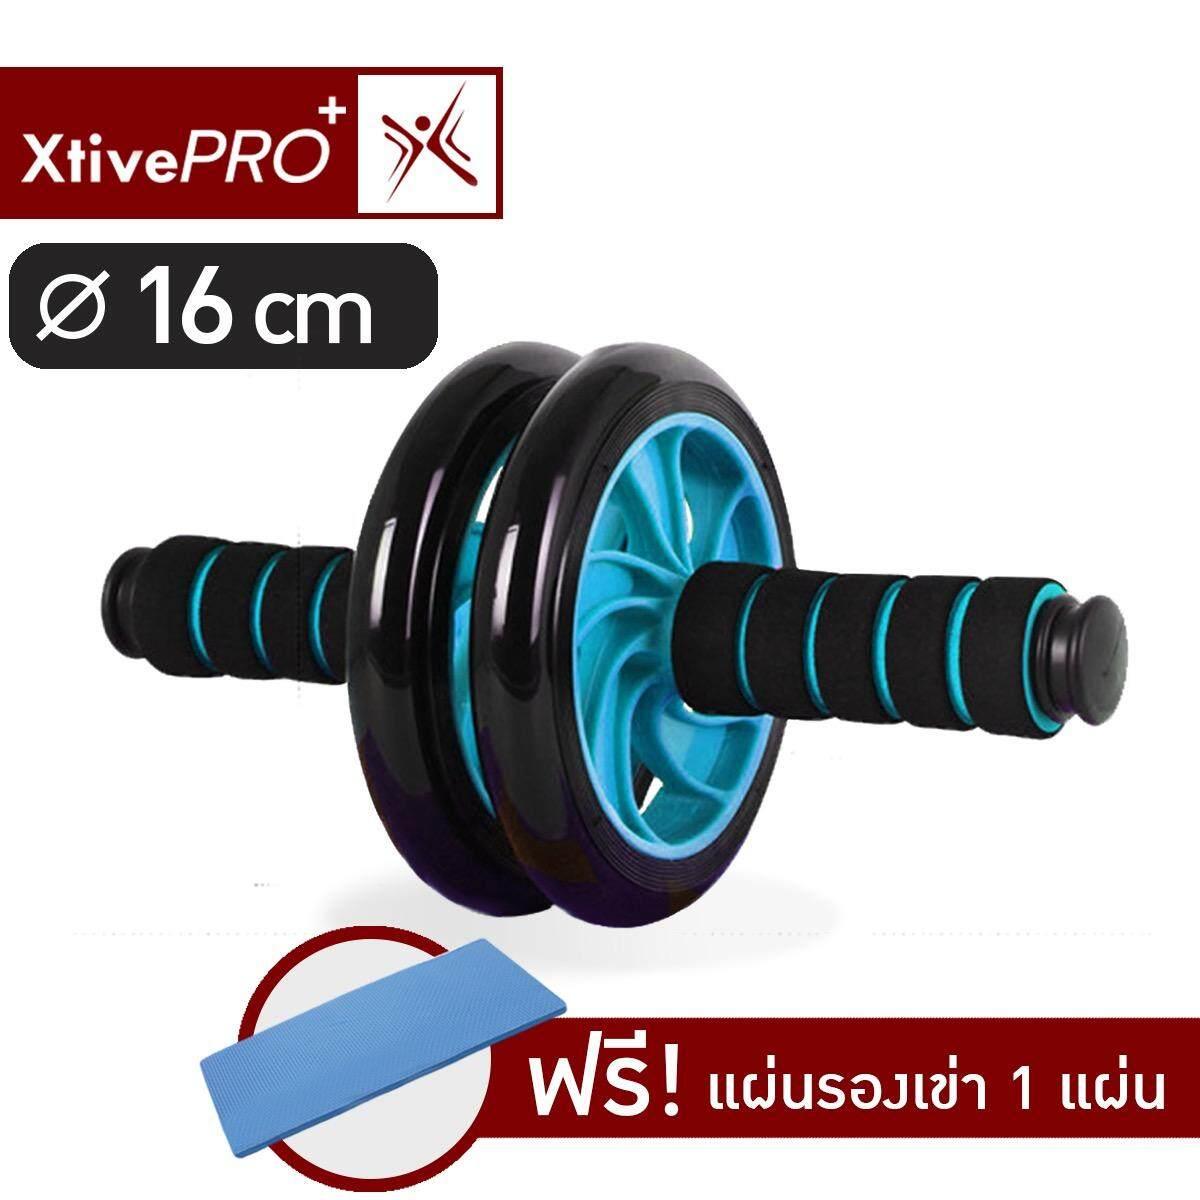 Xtivepro Starter Wheel 16 Cm Blue ลูกกลิ้งบริหารหน้าท้อง Ab Wheel แบบล้อคู่ สีฟ้า ถูก